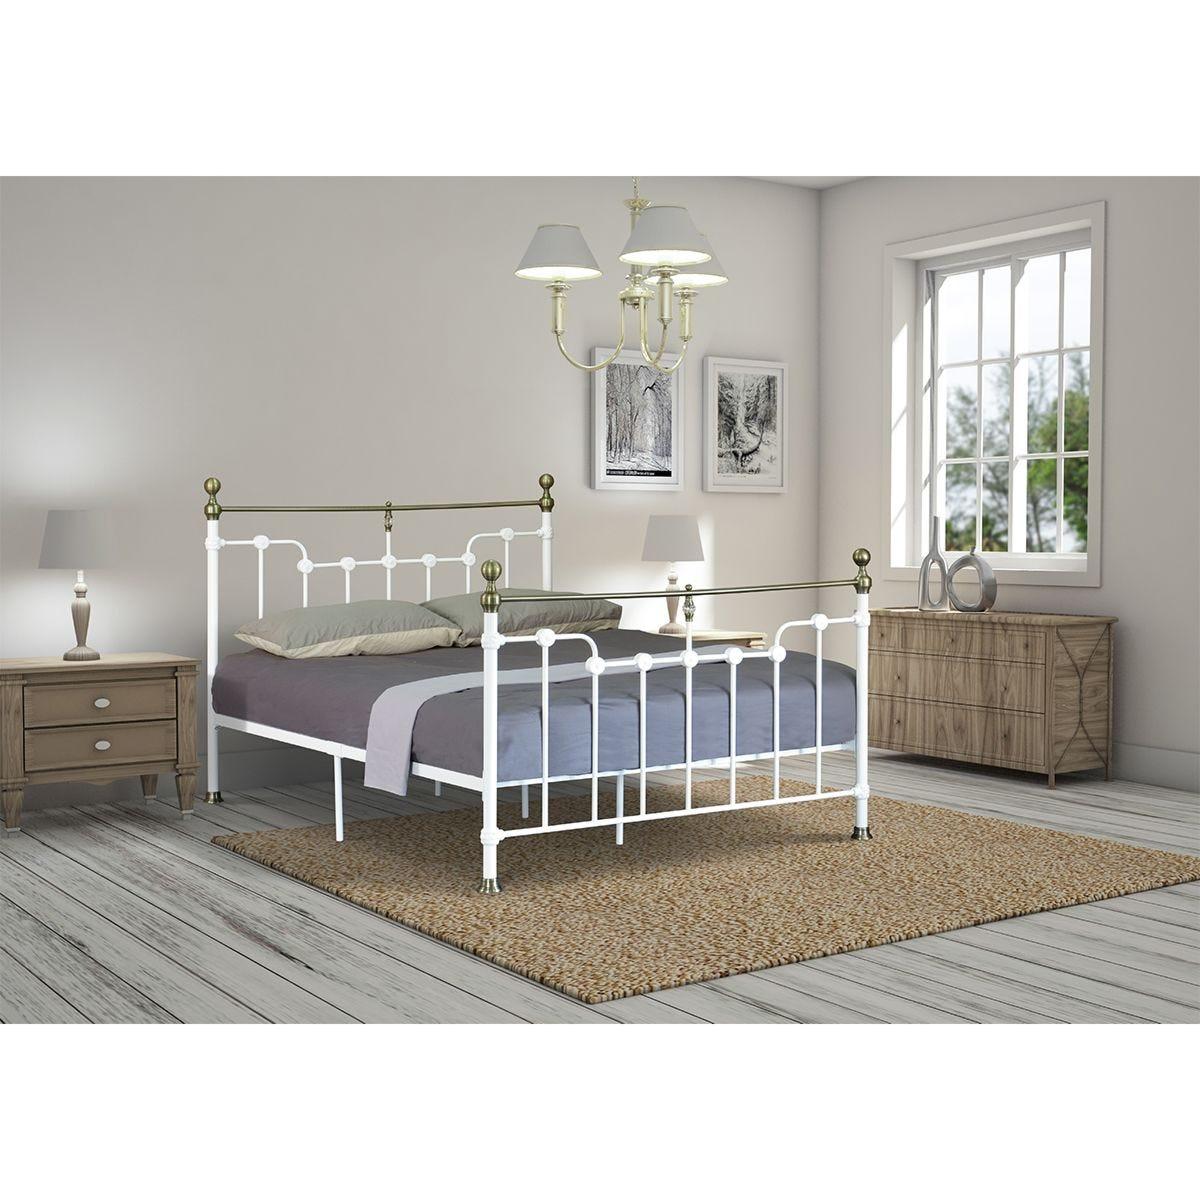 Arabella Metal Bed Frame - White